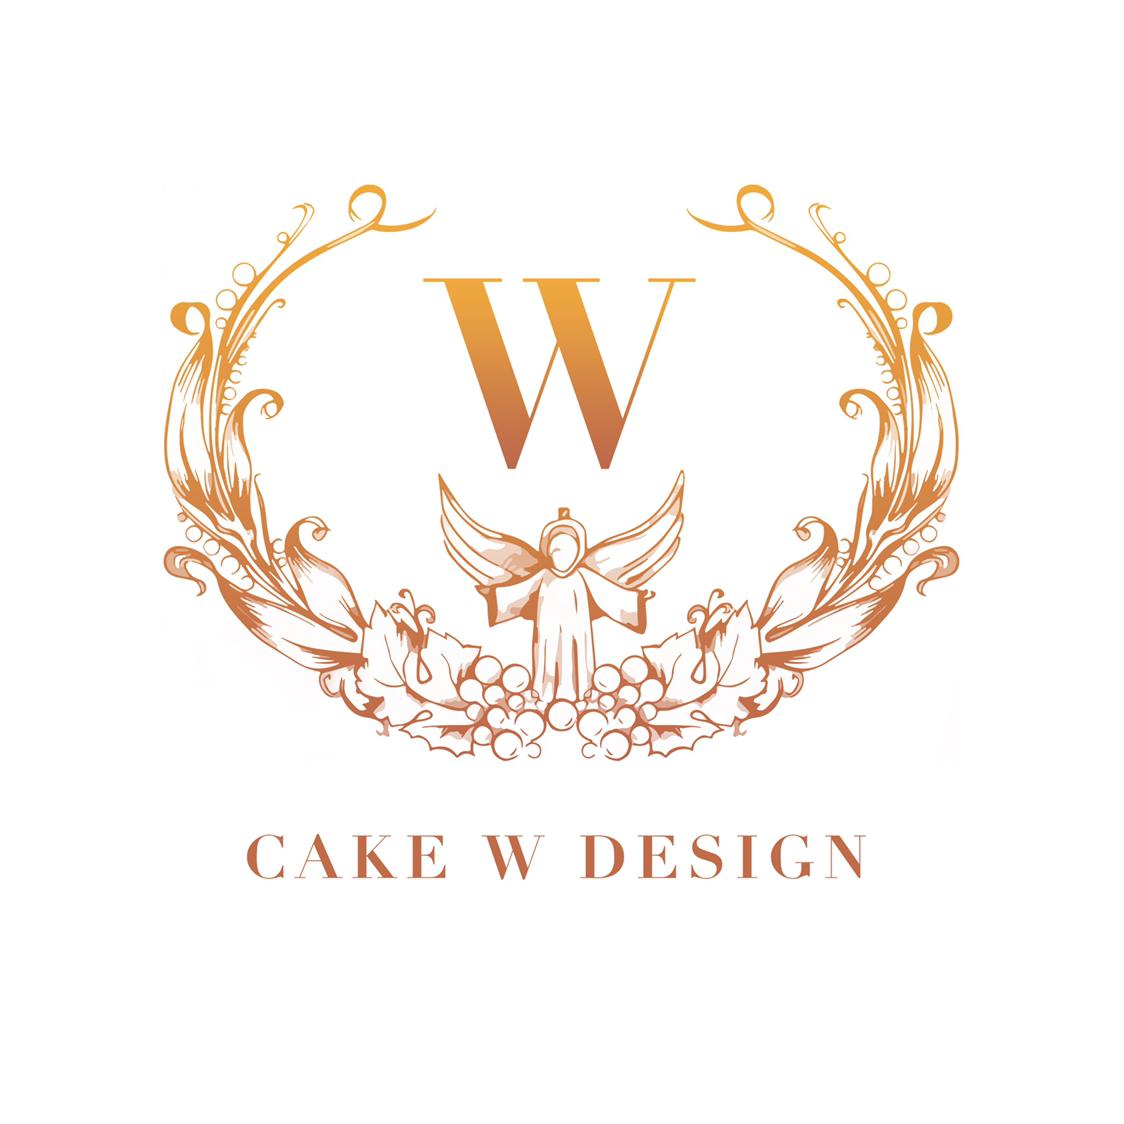 W Design婚礼蛋糕甜品